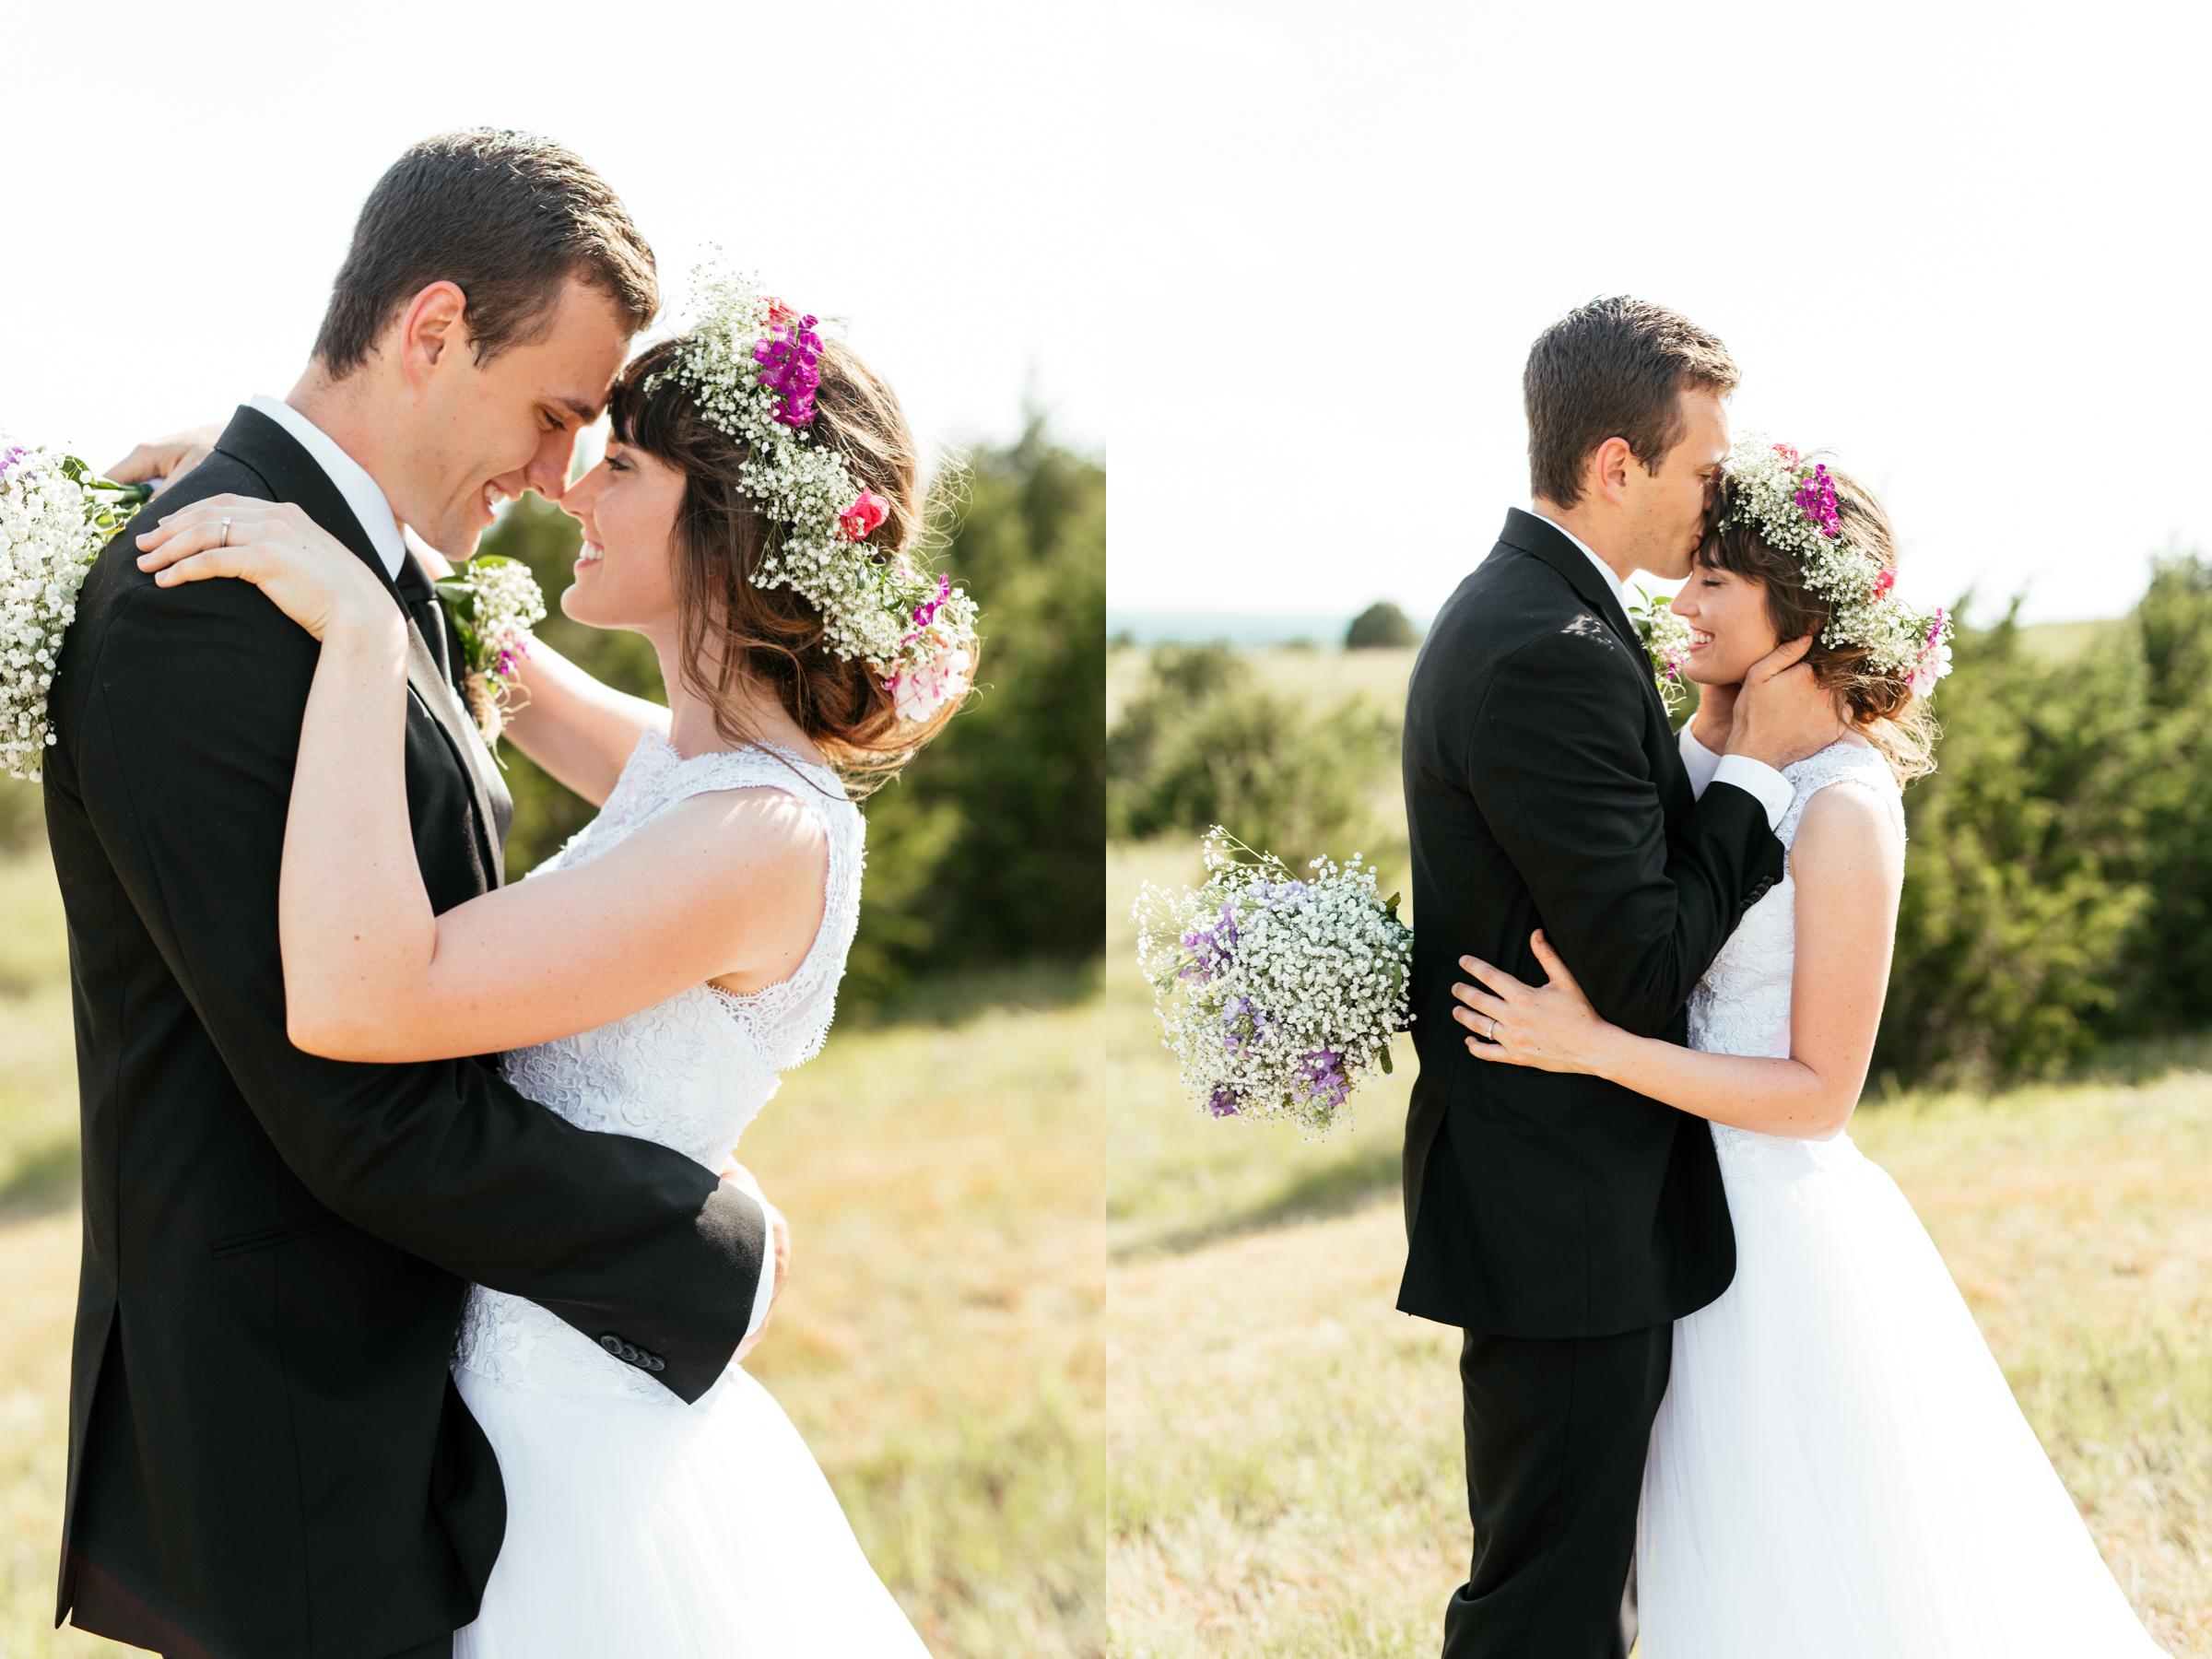 McCurrach Wedding5.jpg